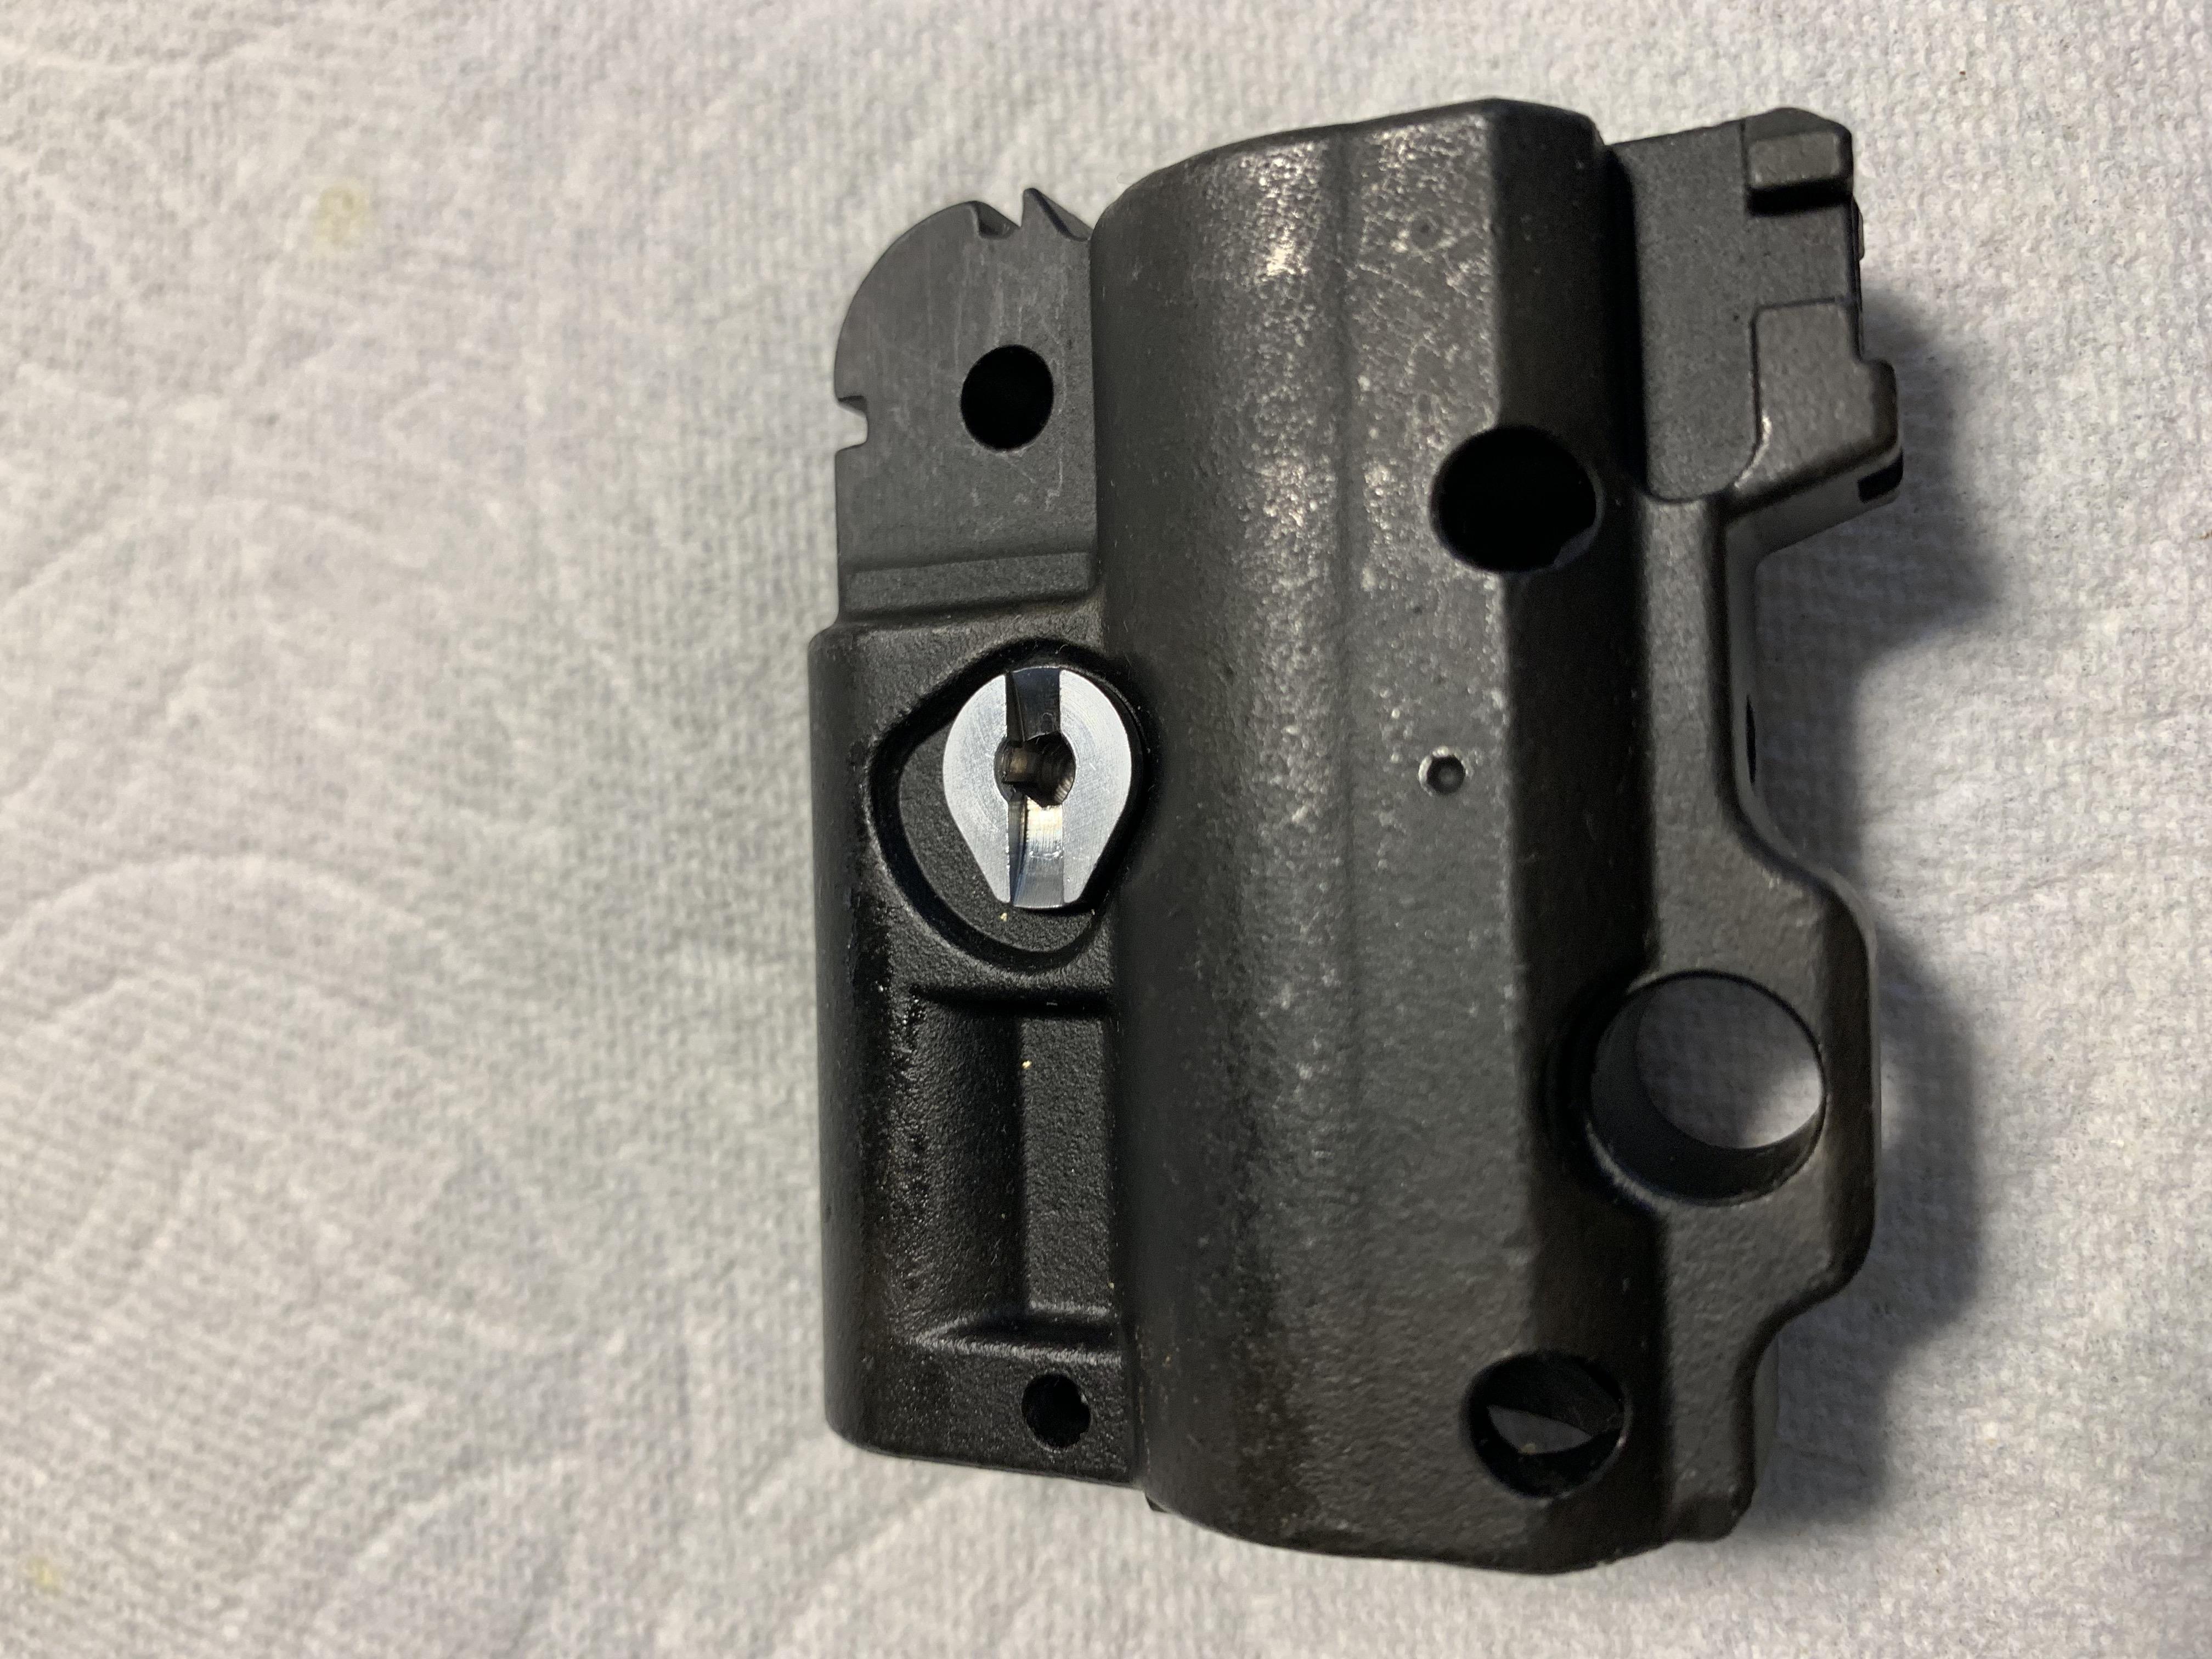 HK416a3 adjustable gasblock questions-w6r6bzfltxin4-unuj16w.jpg